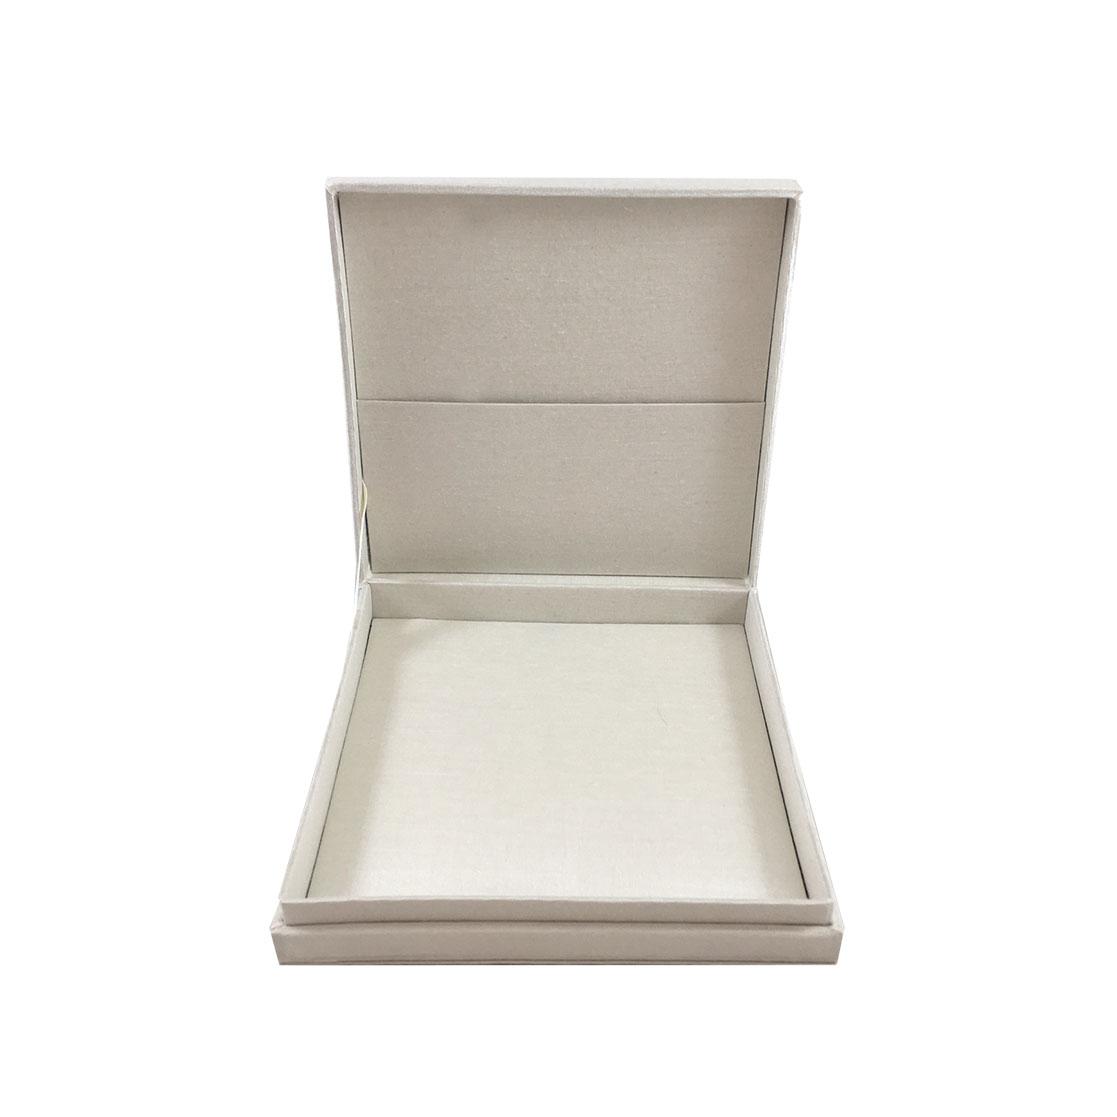 ivory box with pocket holder